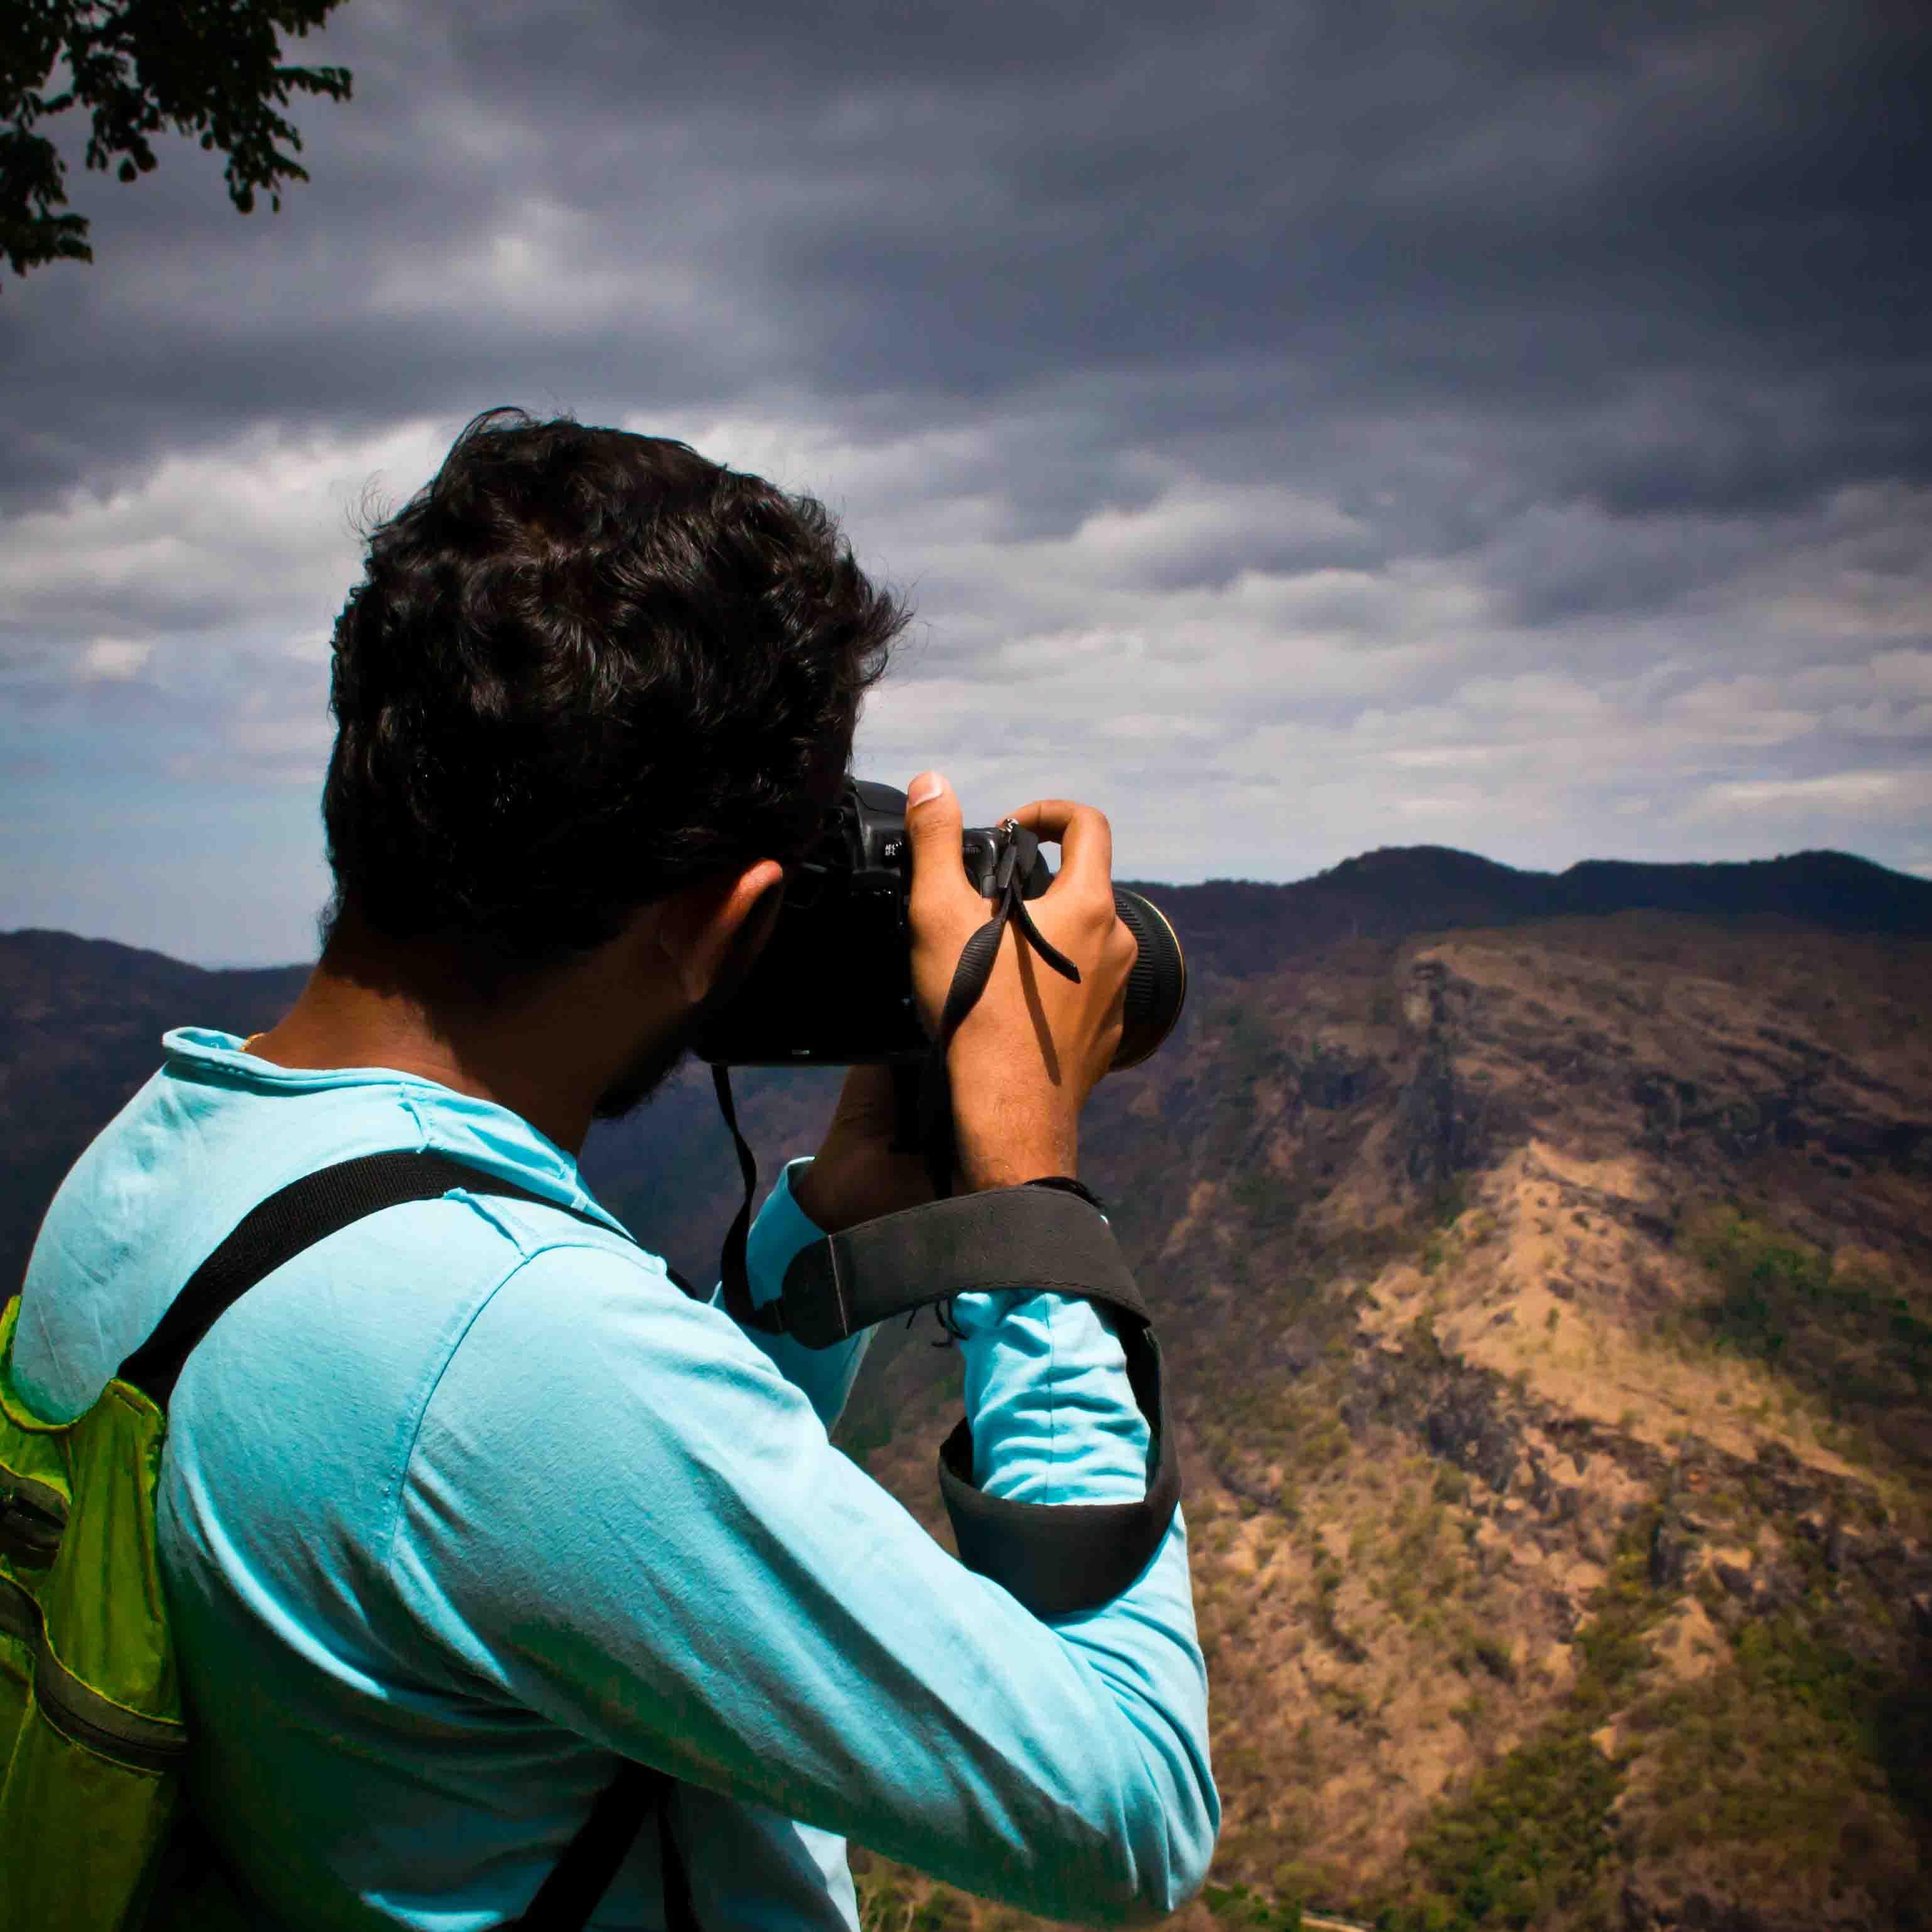 Go to Prithivi Rajan's profile